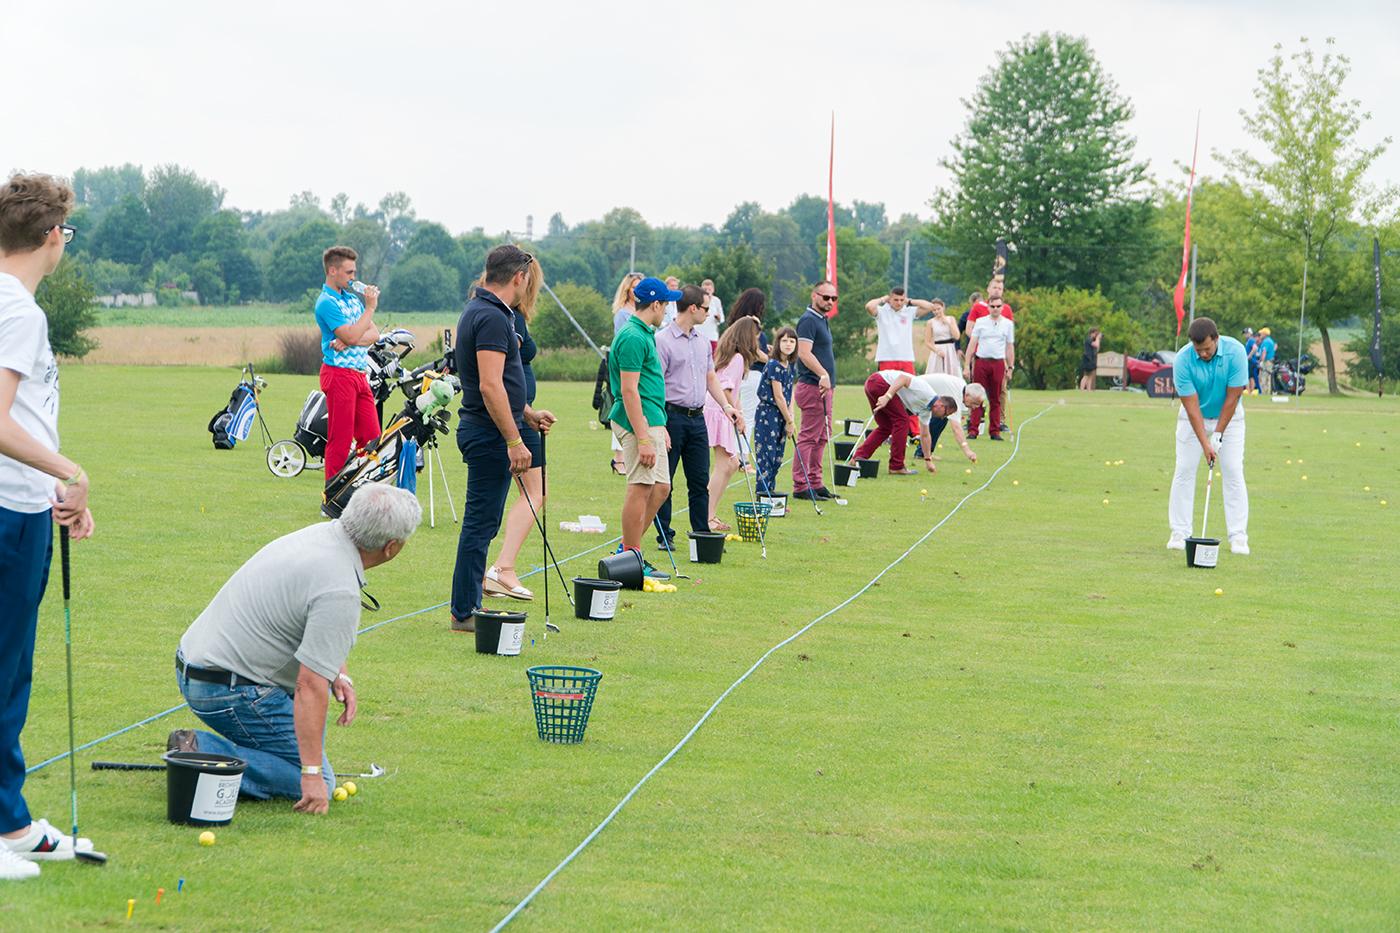 Akademia Nauki gry w golfa